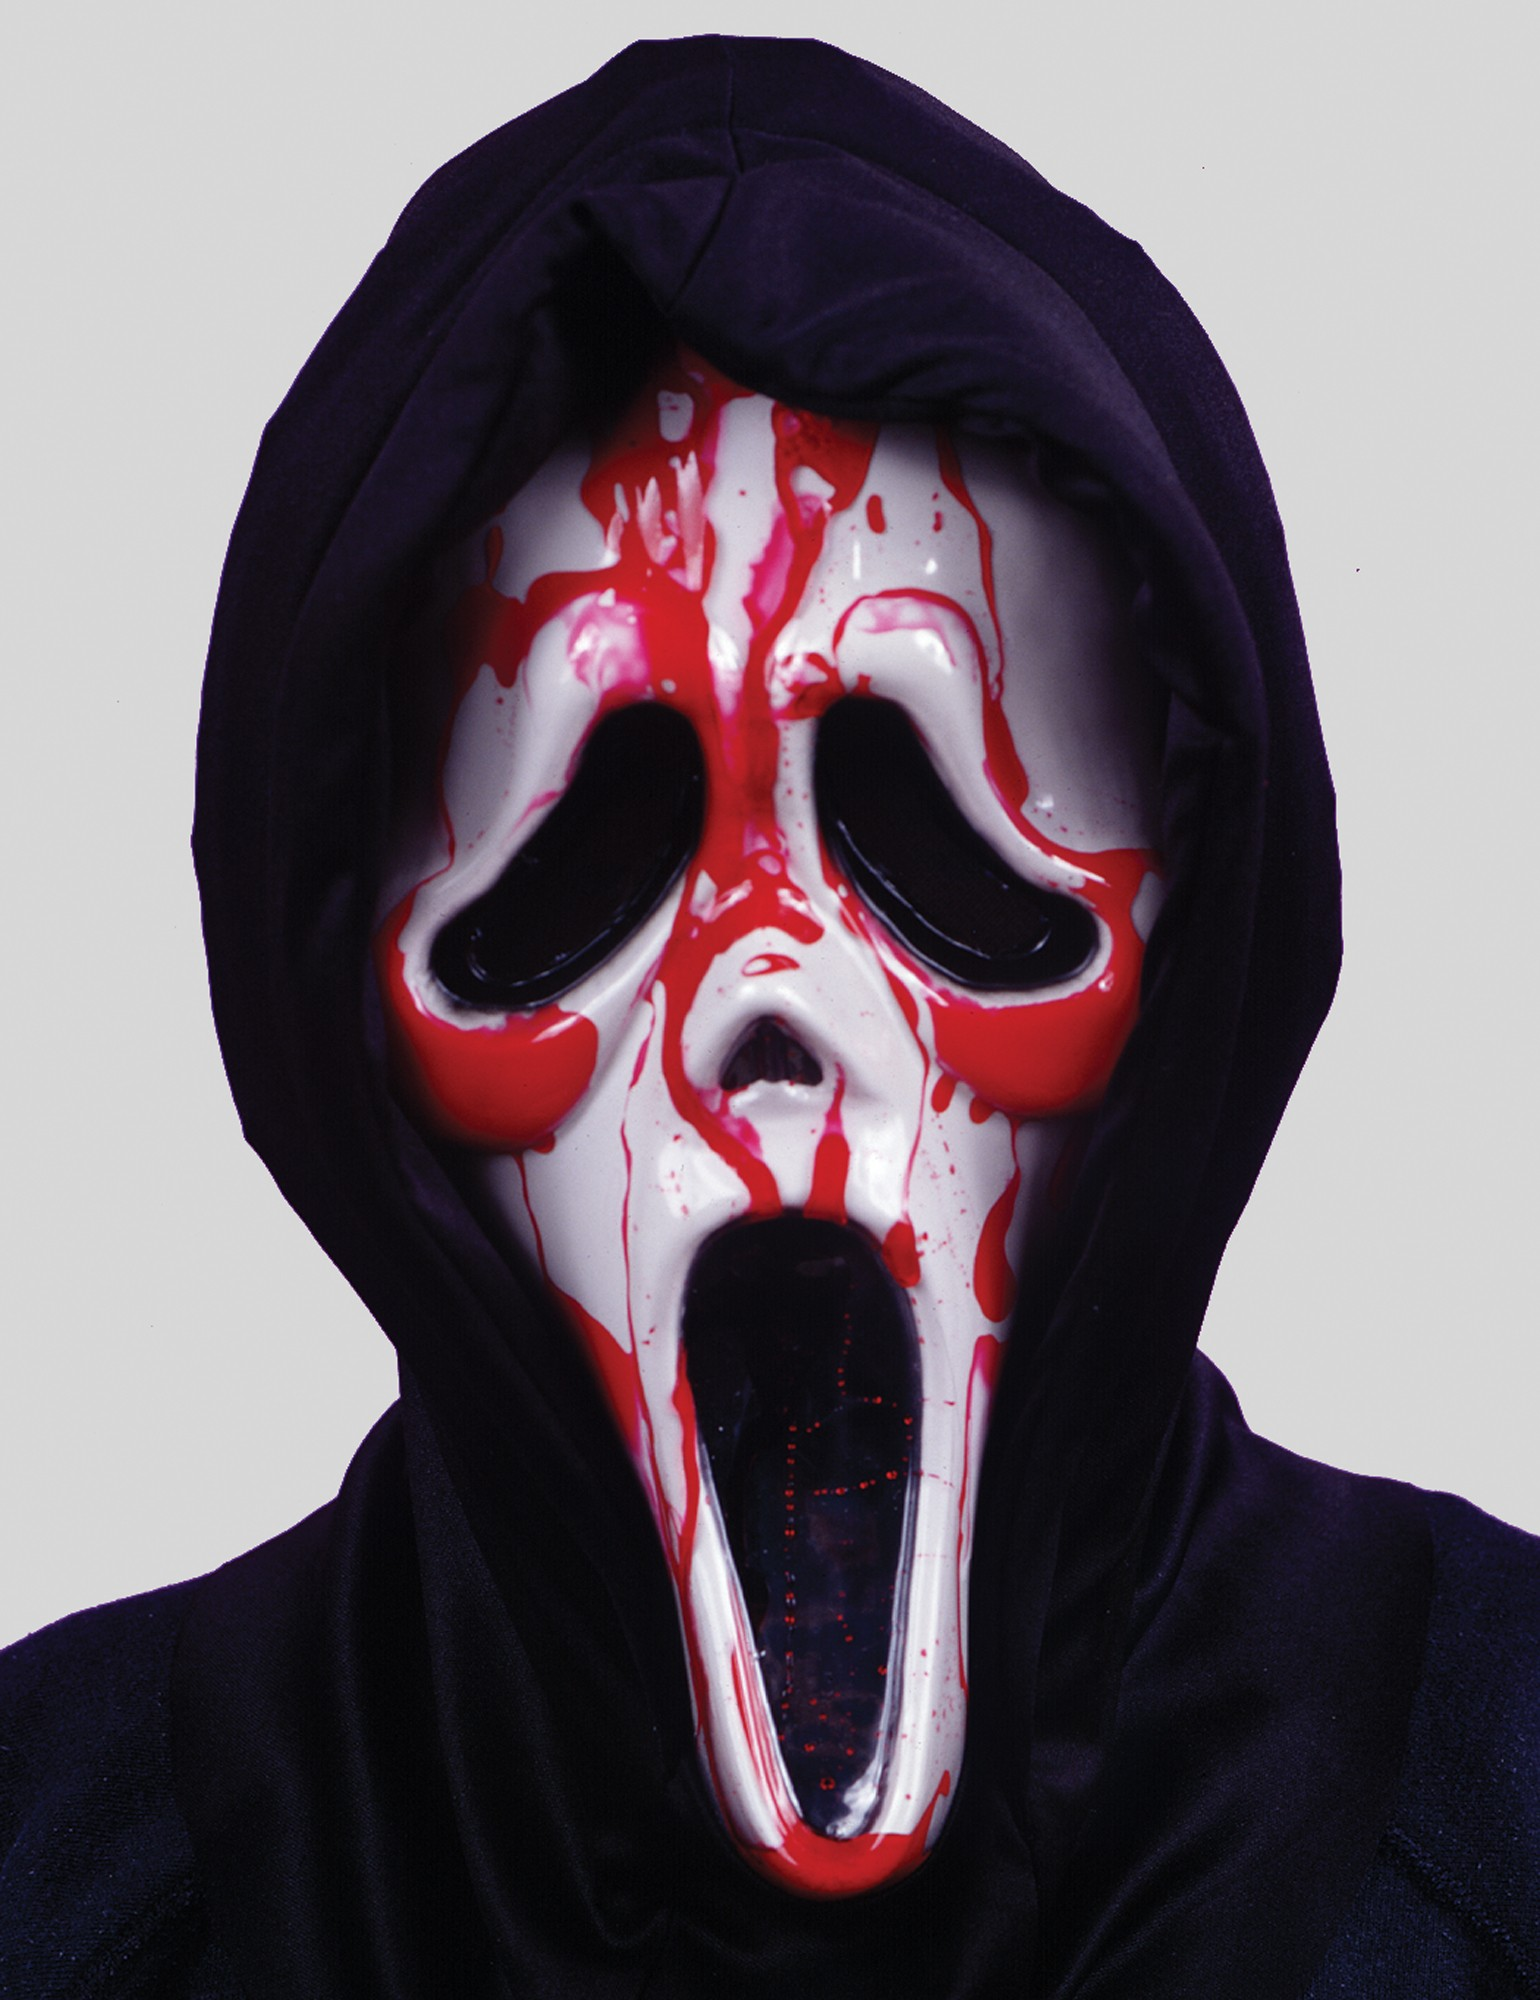 A922 Dripping Bleeding Scream Ghost Face Zombie Mask Halloween ...